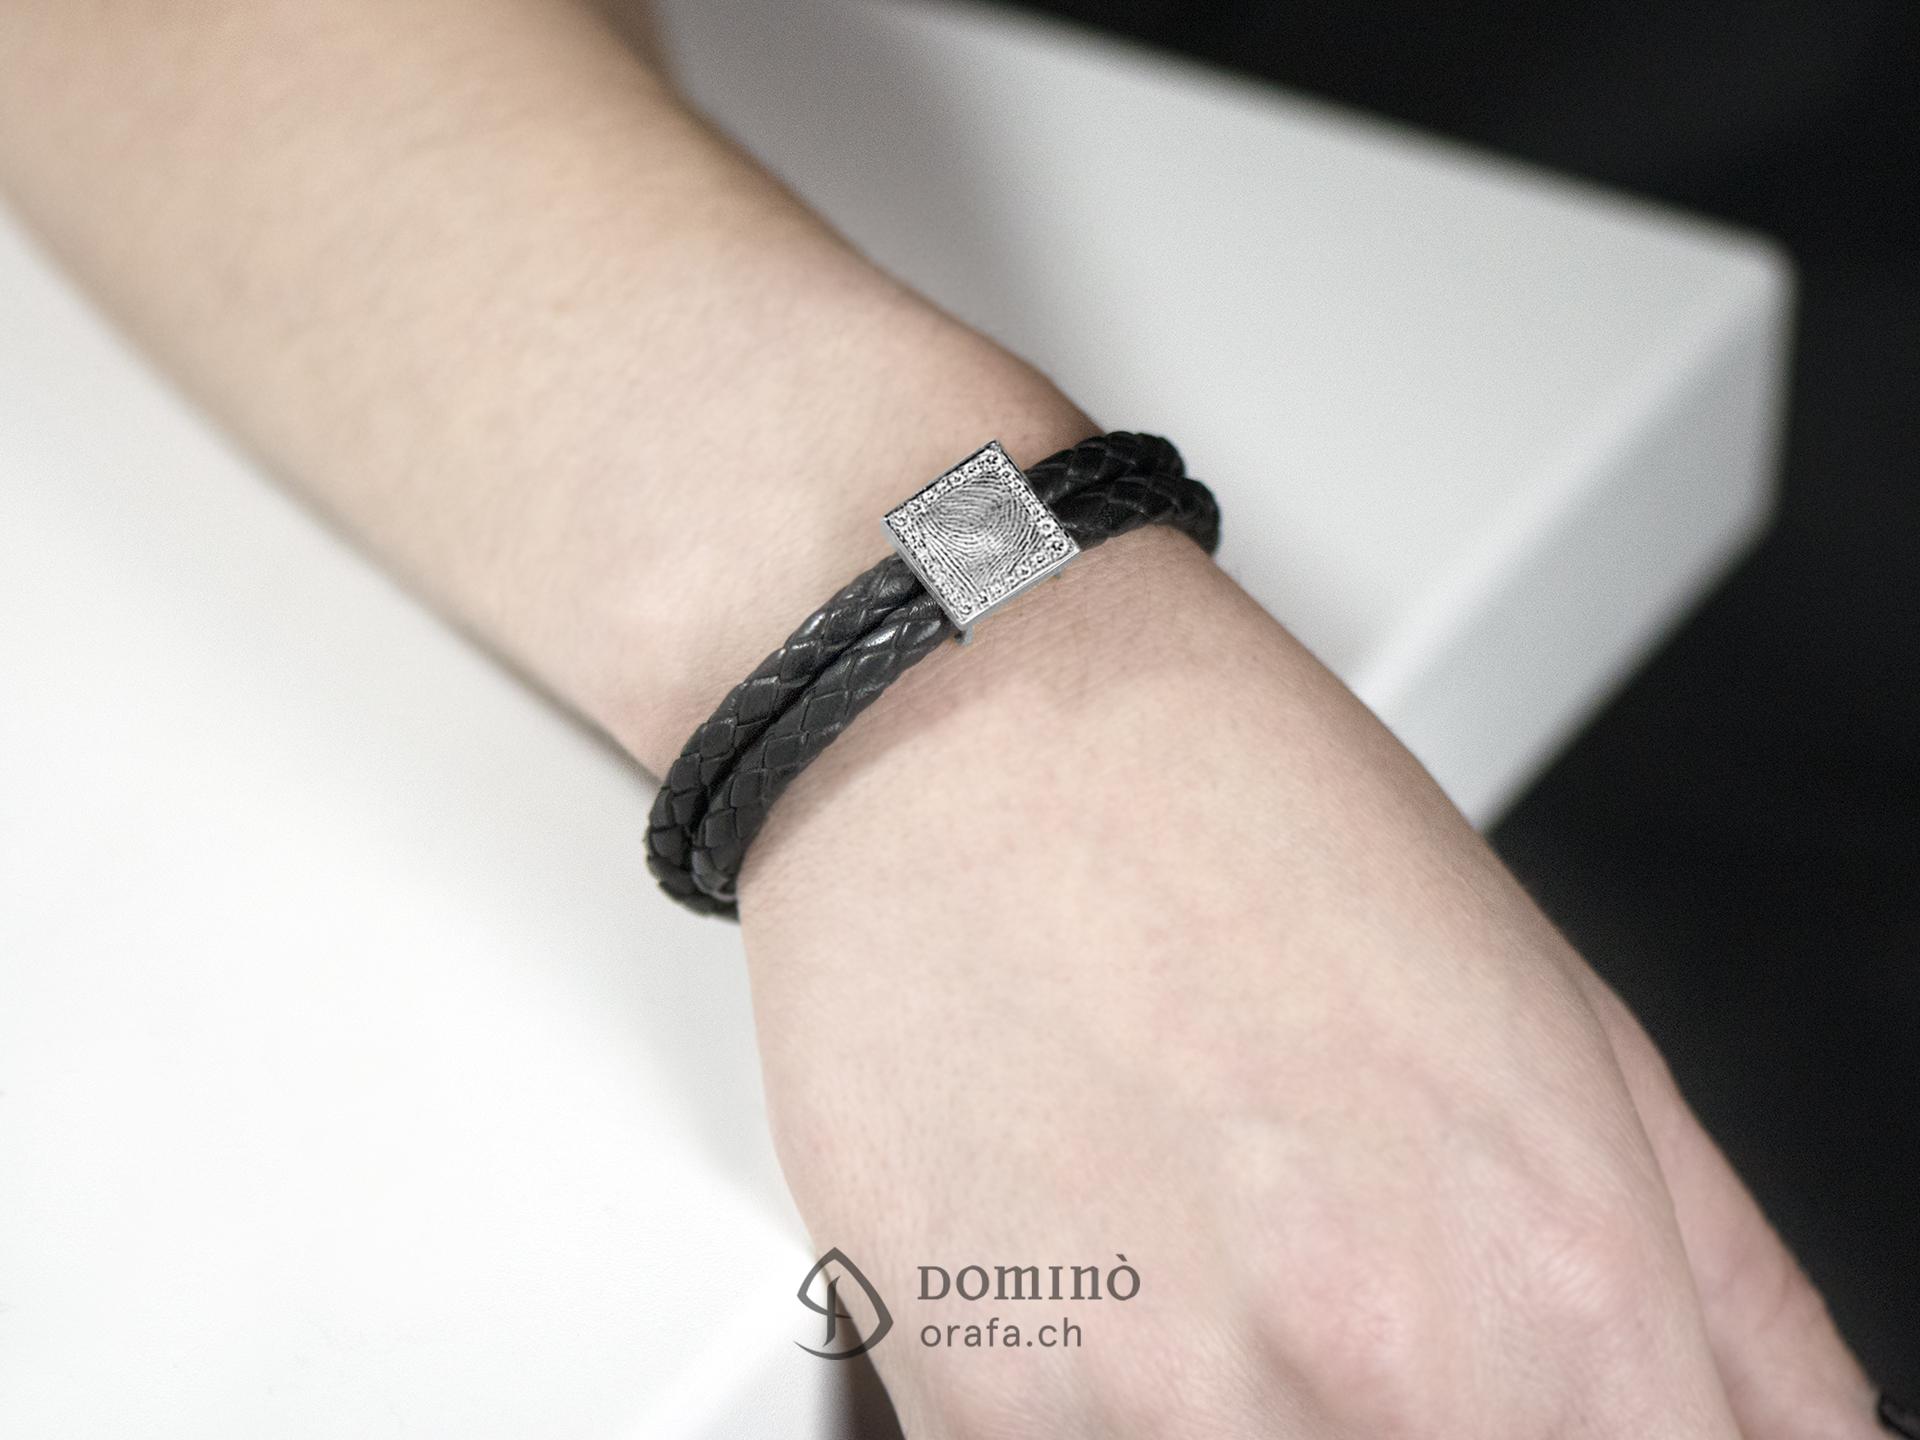 braccialetto-cuoio-impronta-digitale-quadrata-contorno-diamanti-2